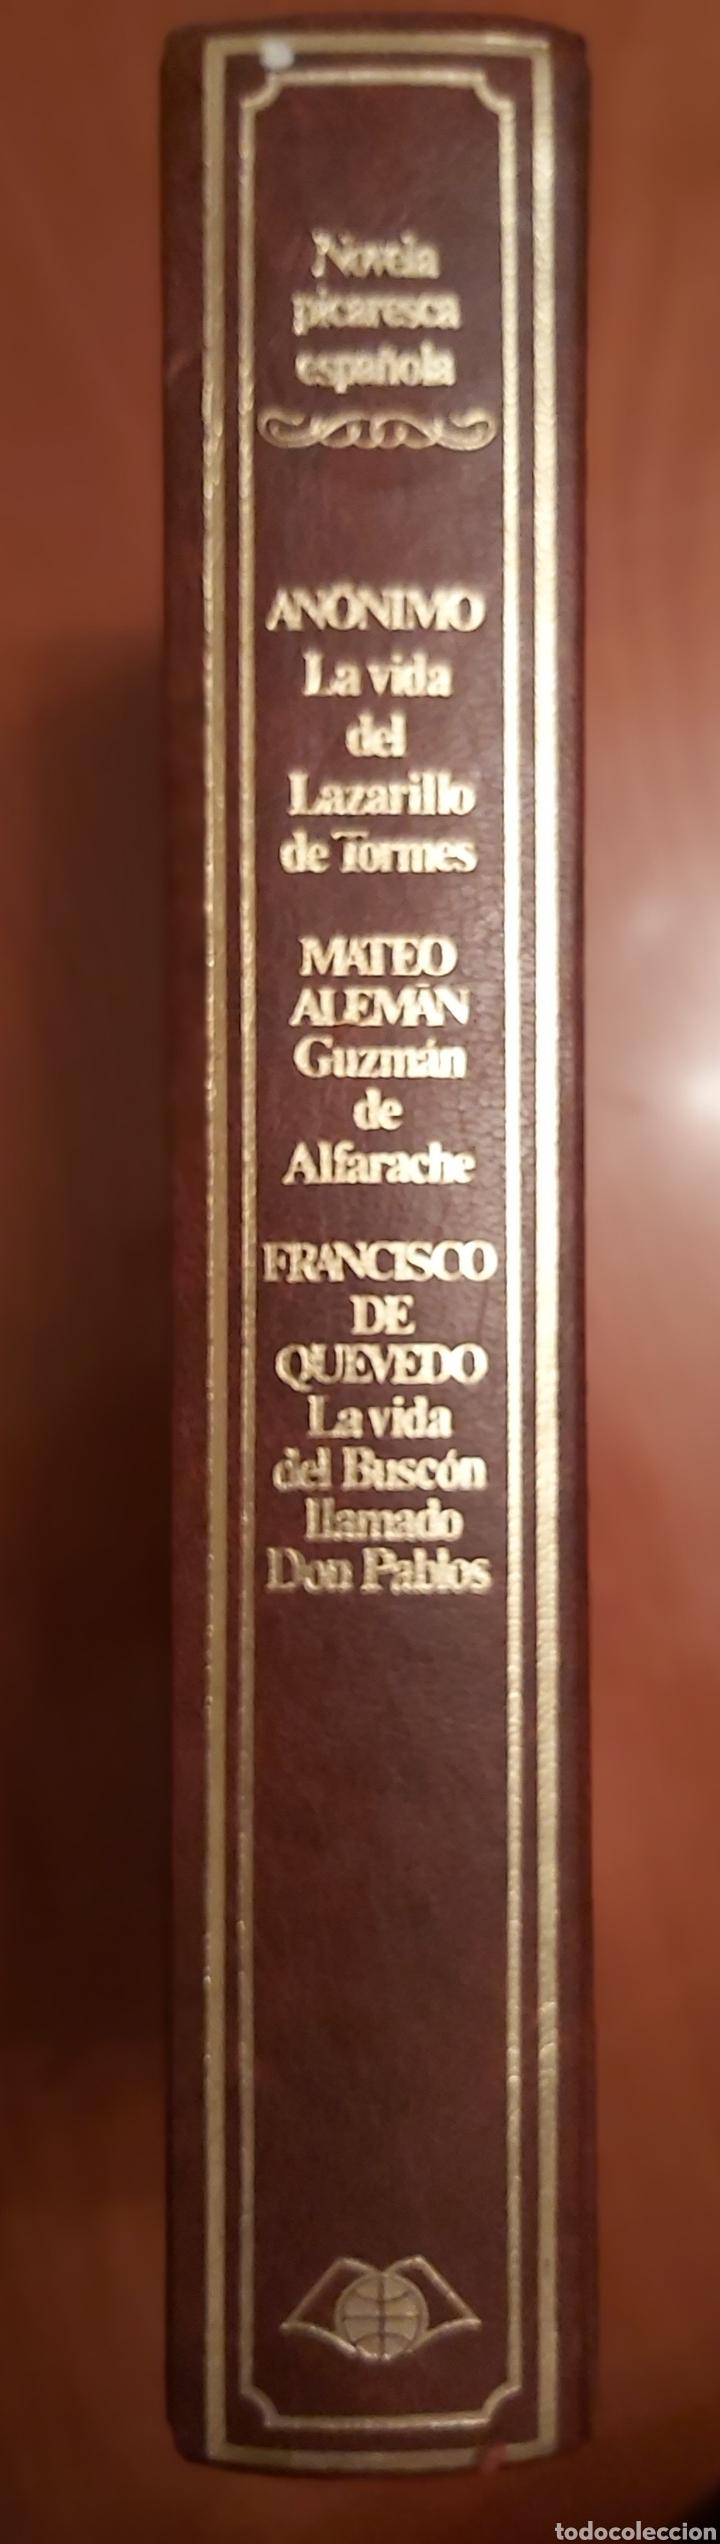 NOVELA PICARESCA ESPAÑOLA. ED 1982 (Libros de Segunda Mano (posteriores a 1936) - Literatura - Narrativa - Clásicos)